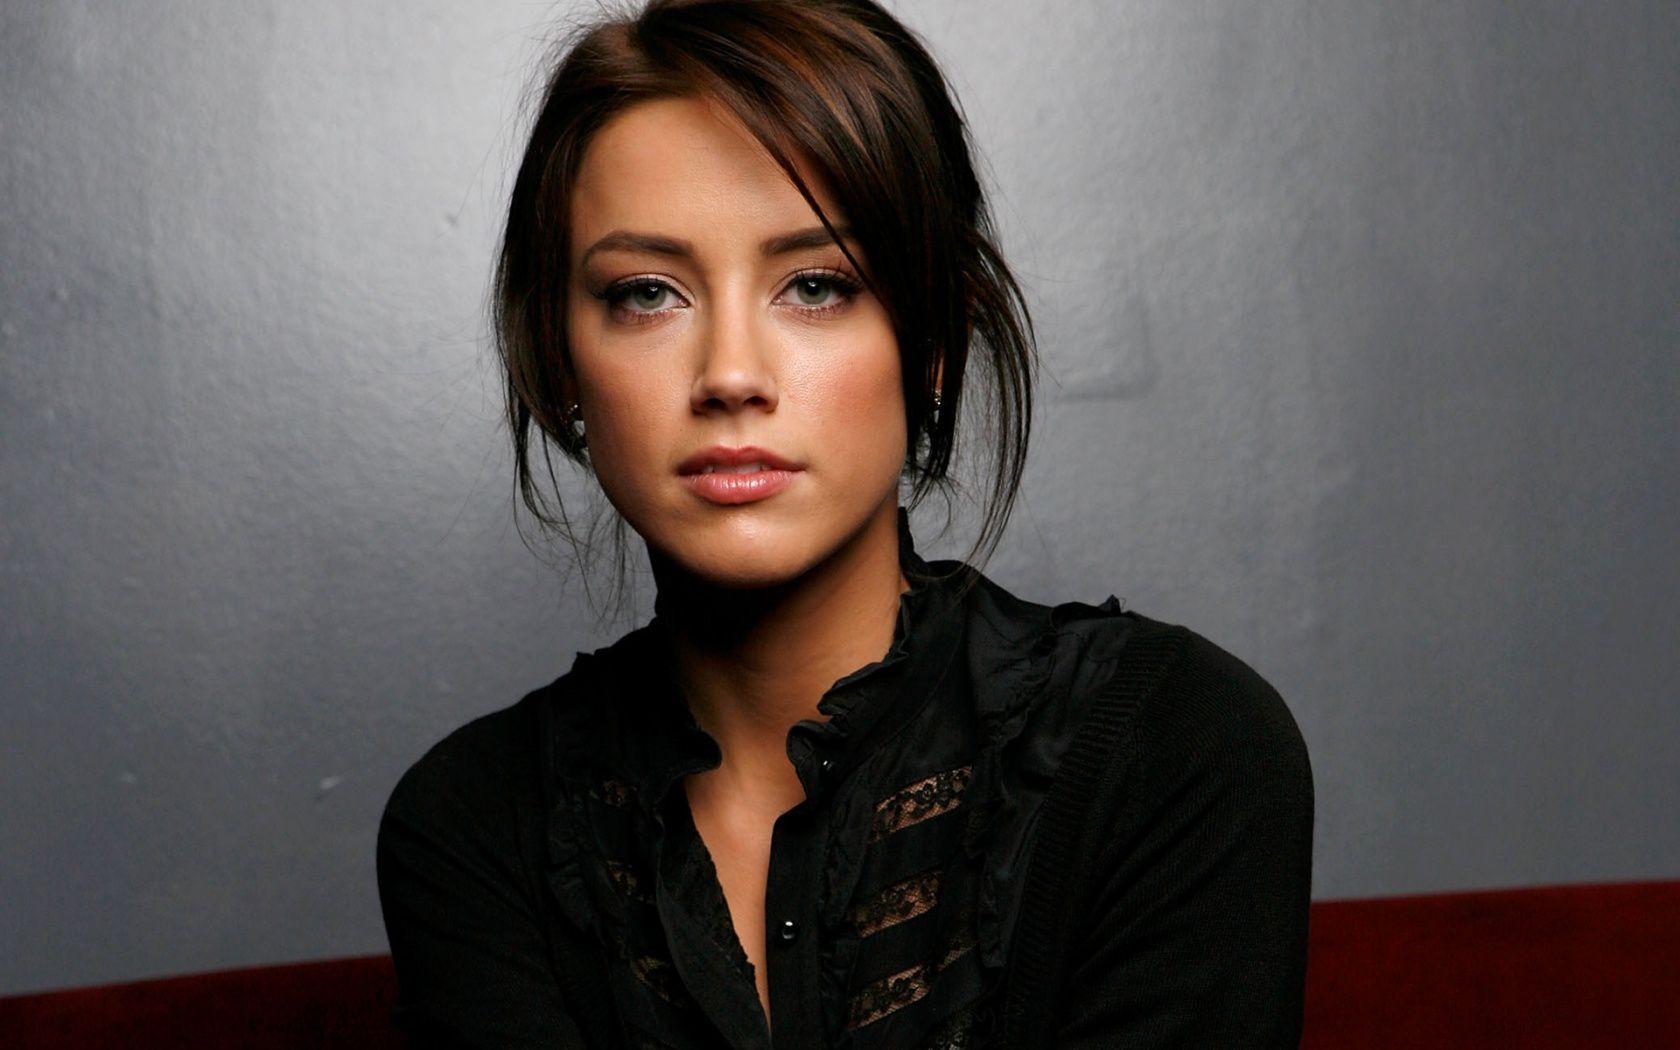 brunettes women actress - photo #23